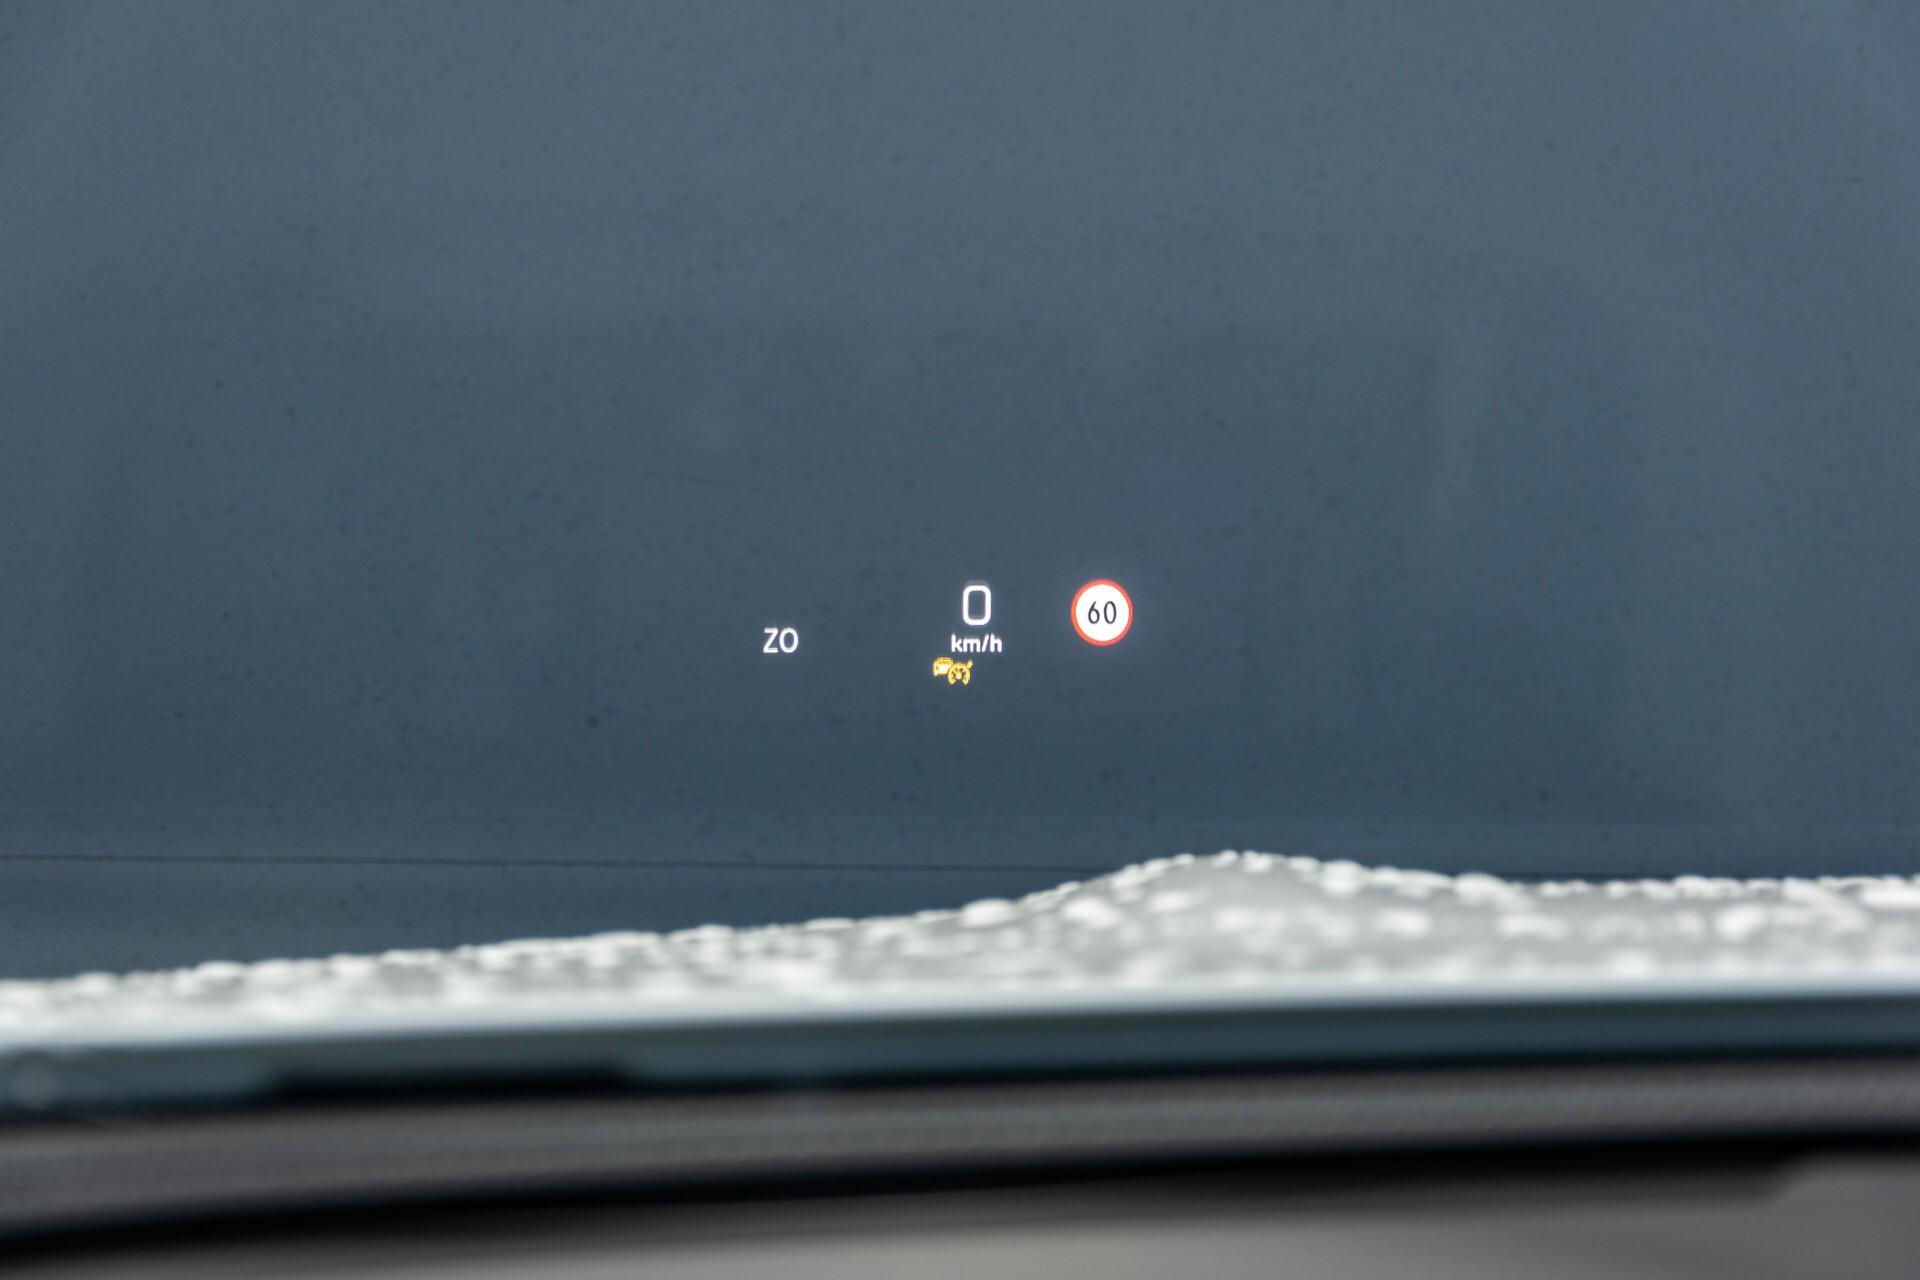 Mercedes-Benz E-Klasse Coupé 300 AMG Panorama/Rij-assist/Keyless/Massage/Memory/HUD/Standkachel/Night Aut9 Foto 9